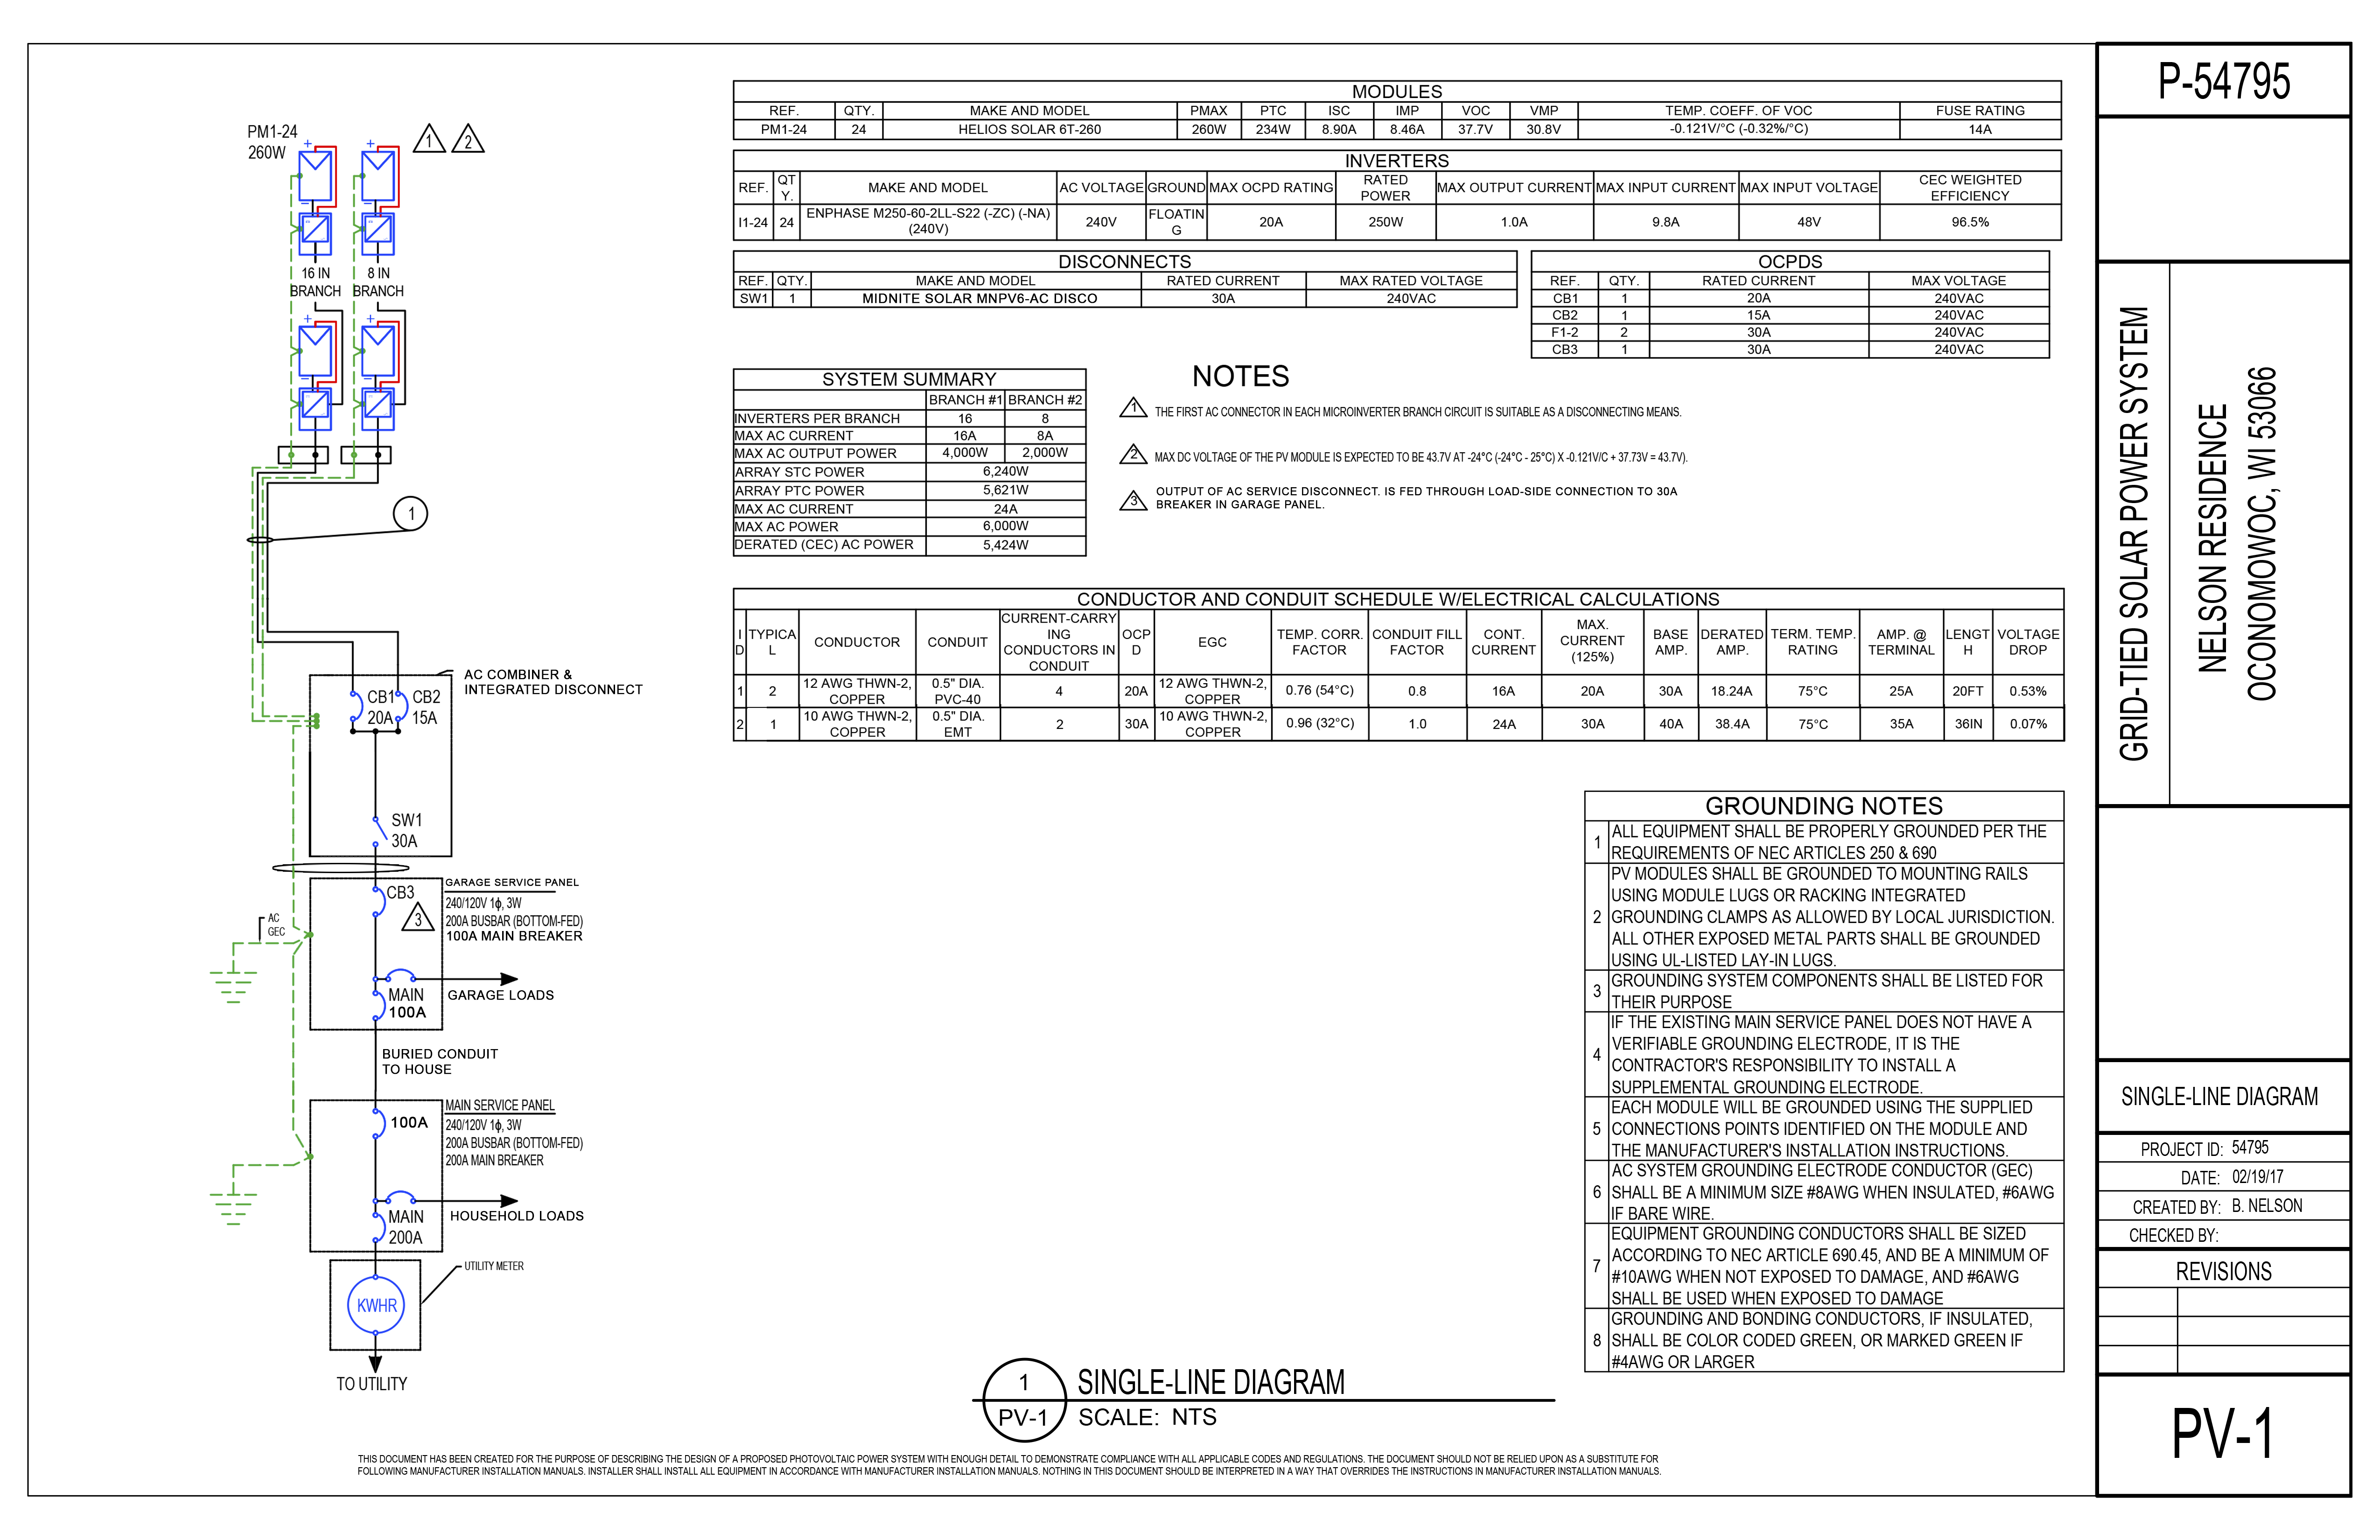 120v conduit diagram   20 wiring diagram images